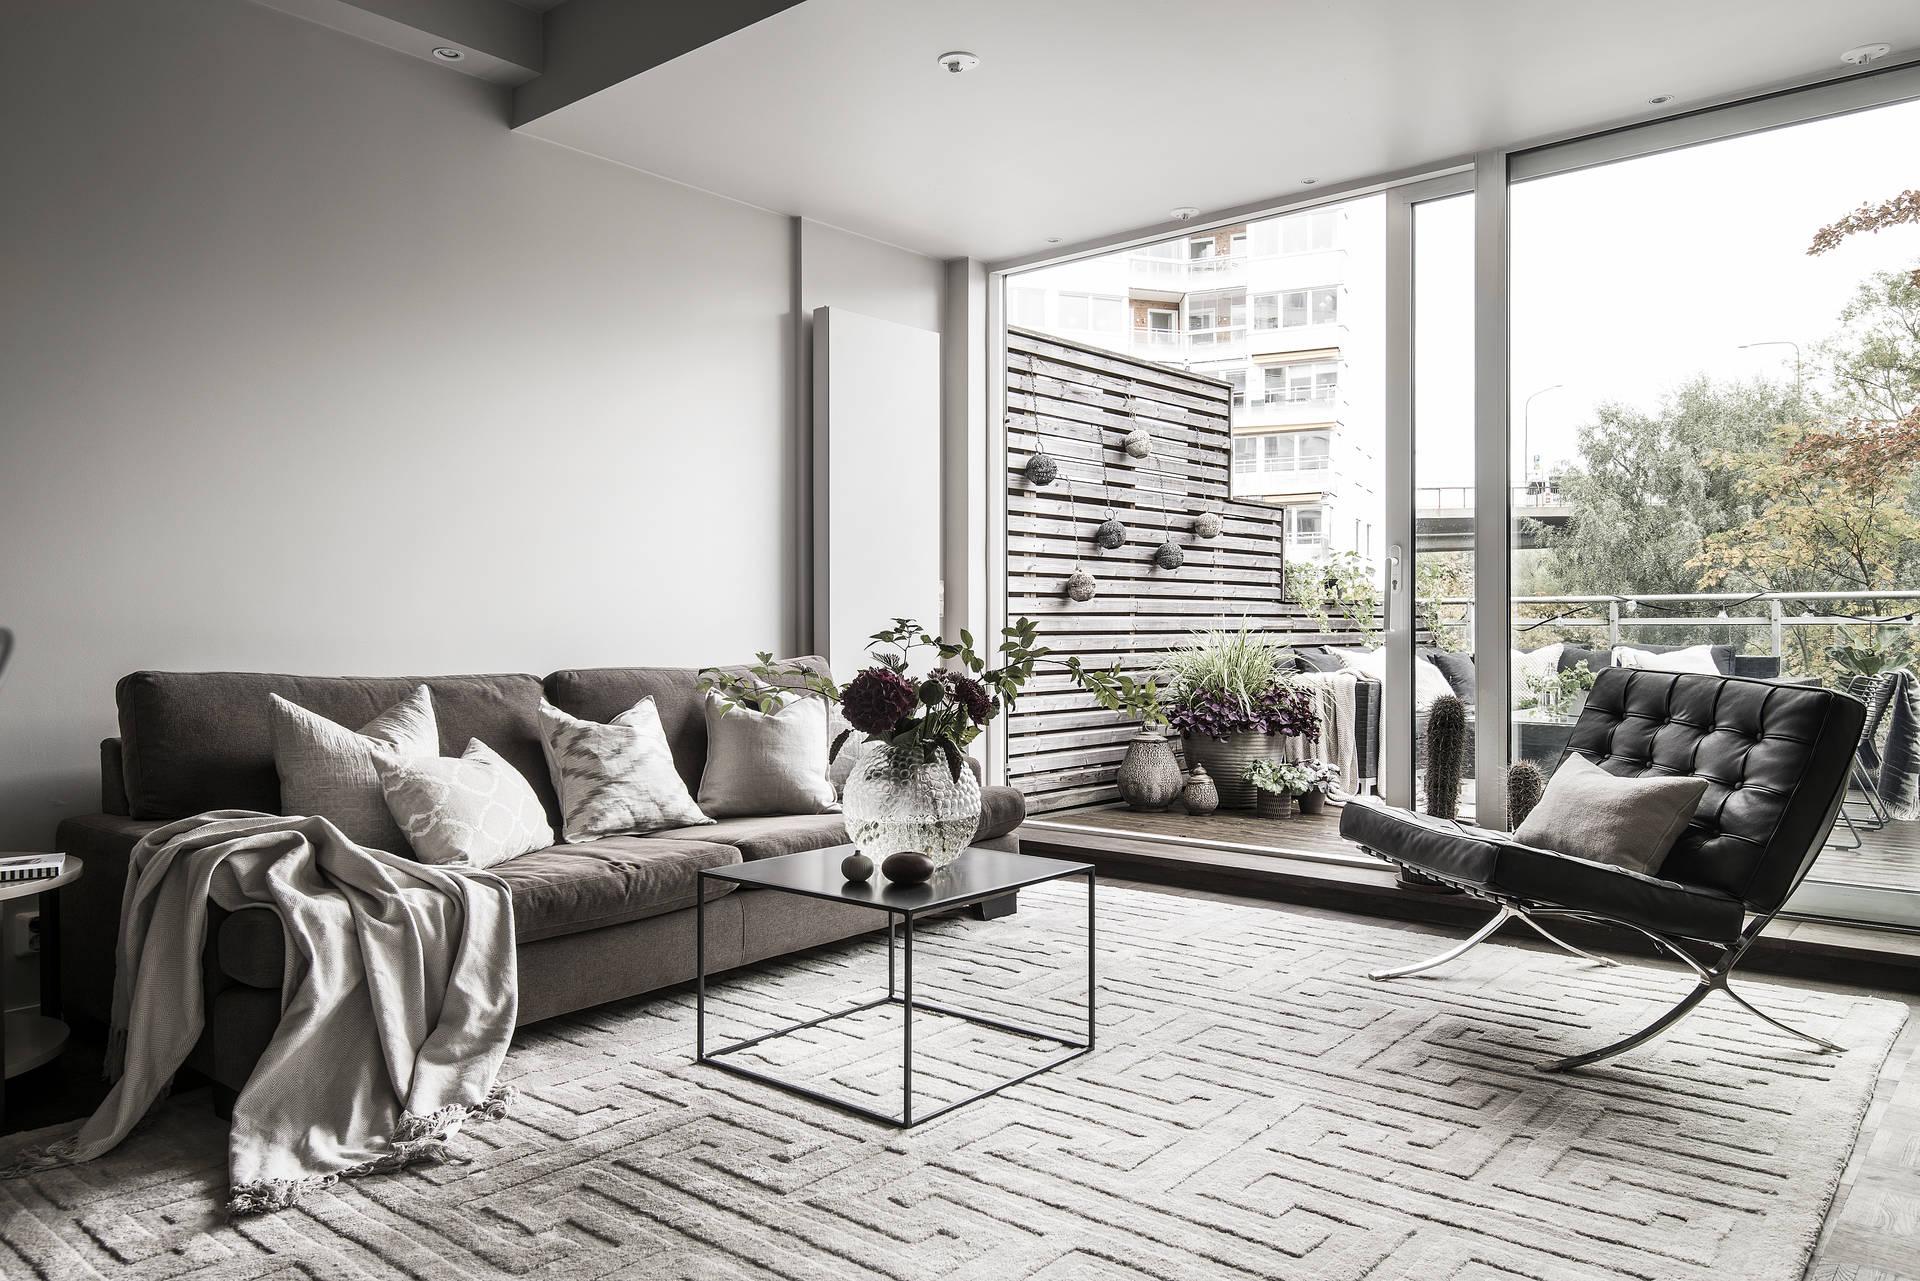 комната диван ковер кресло столтк